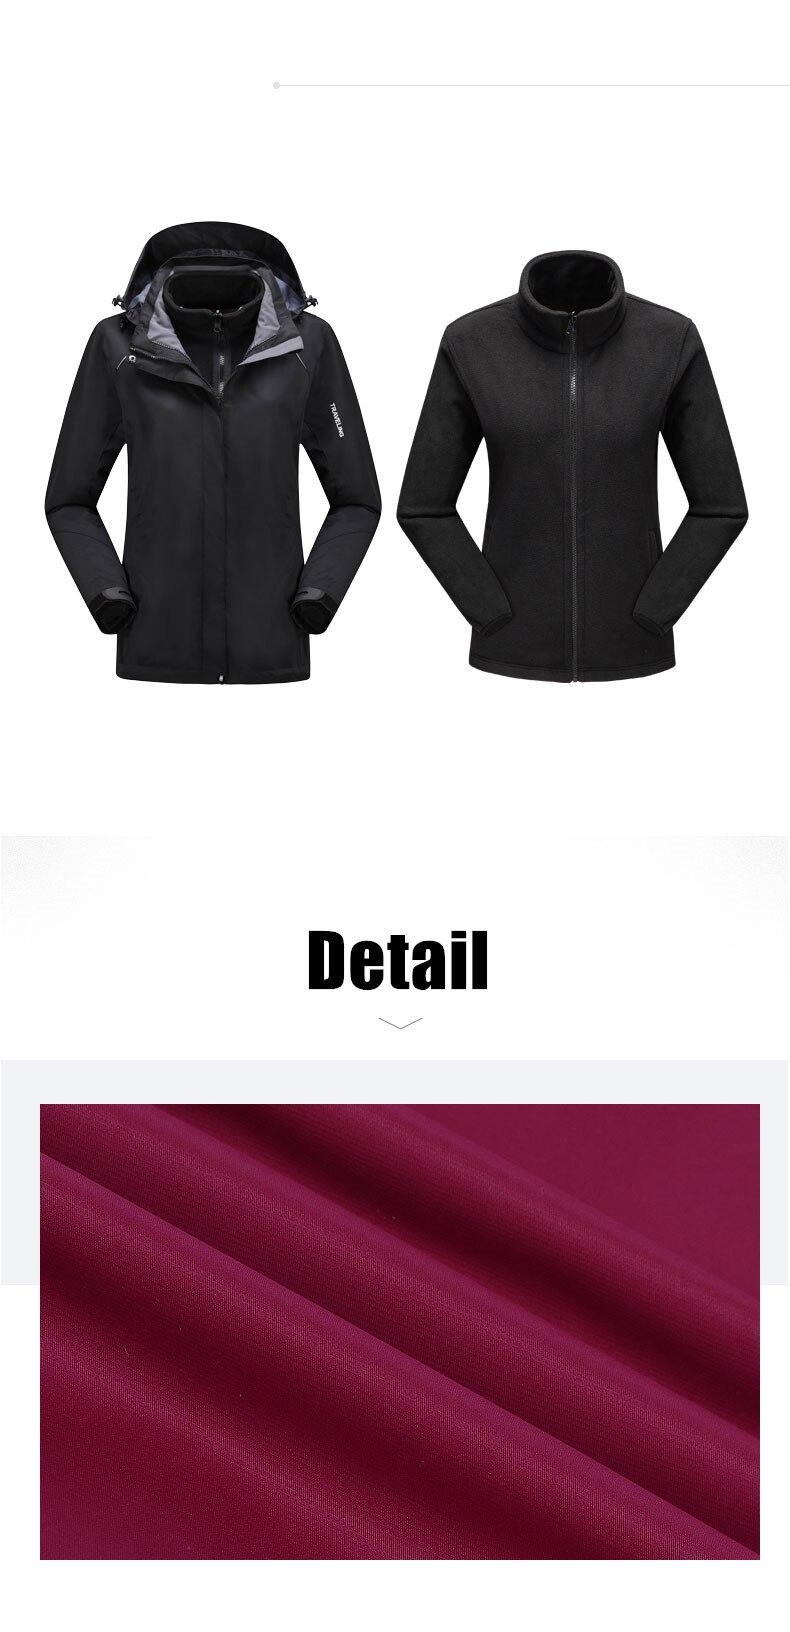 Marca de chuva jaqueta masculina à prova